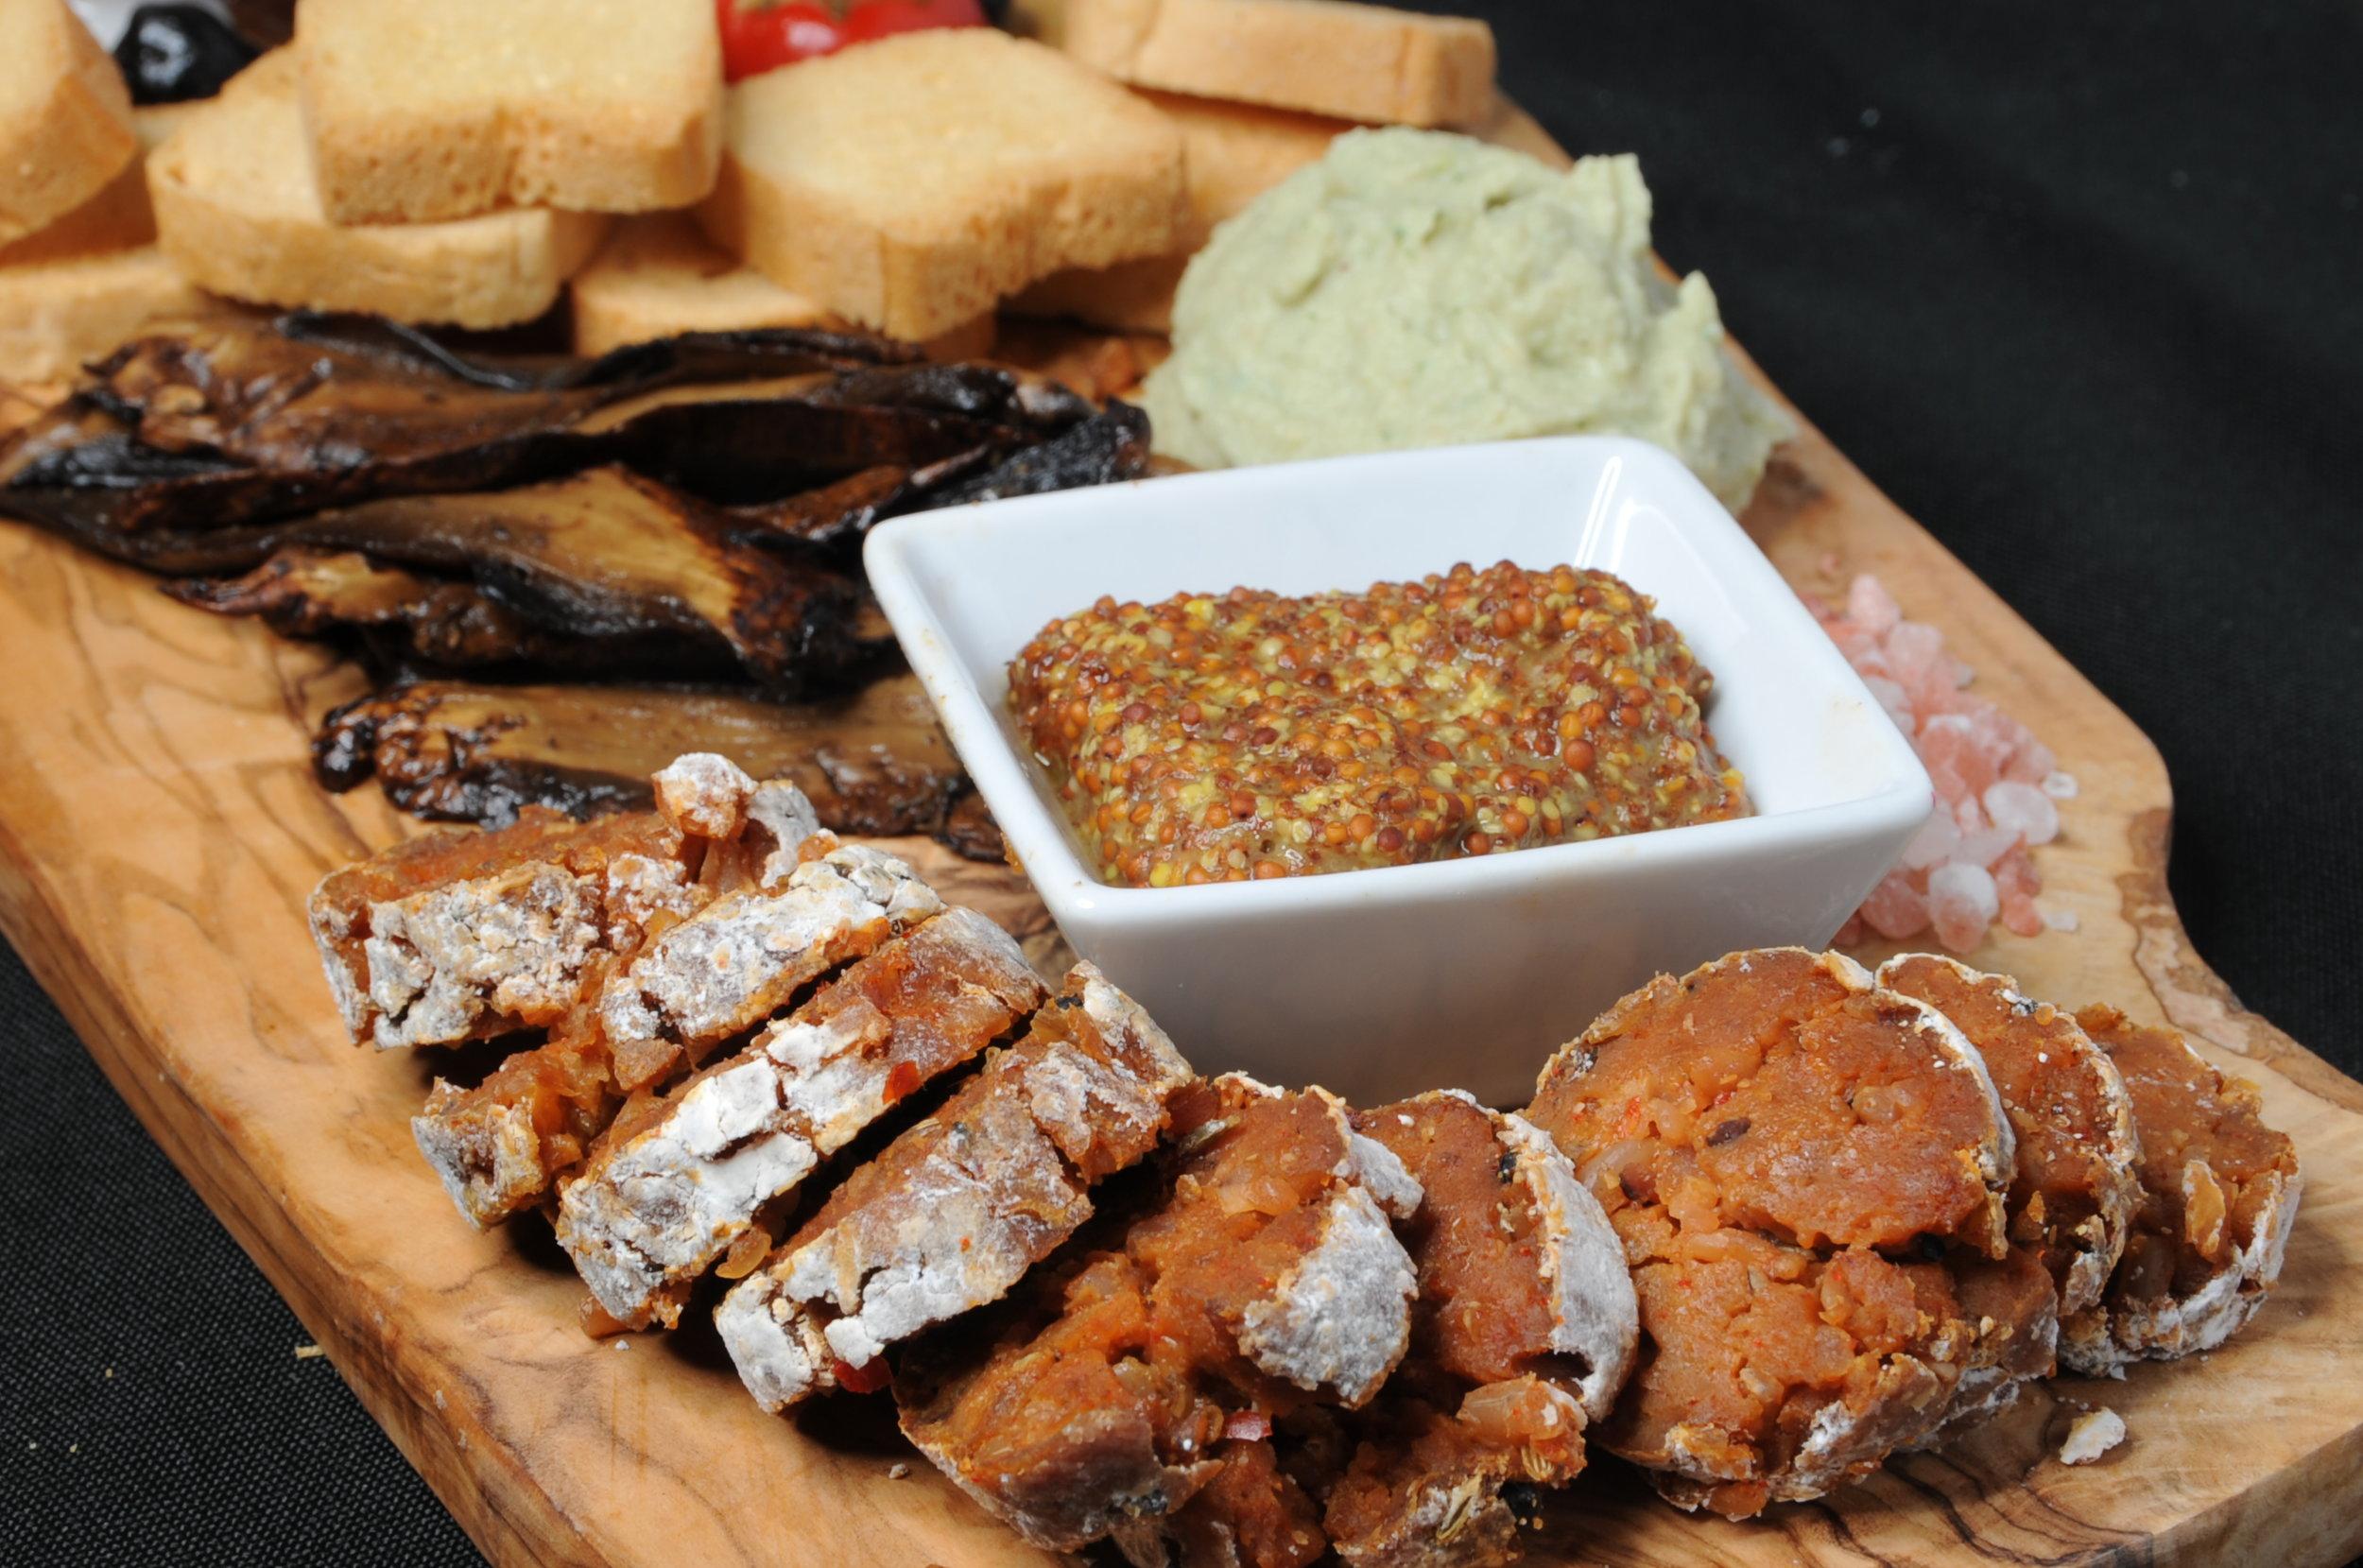 Vegan Charcuterie Board with Housemade Salami